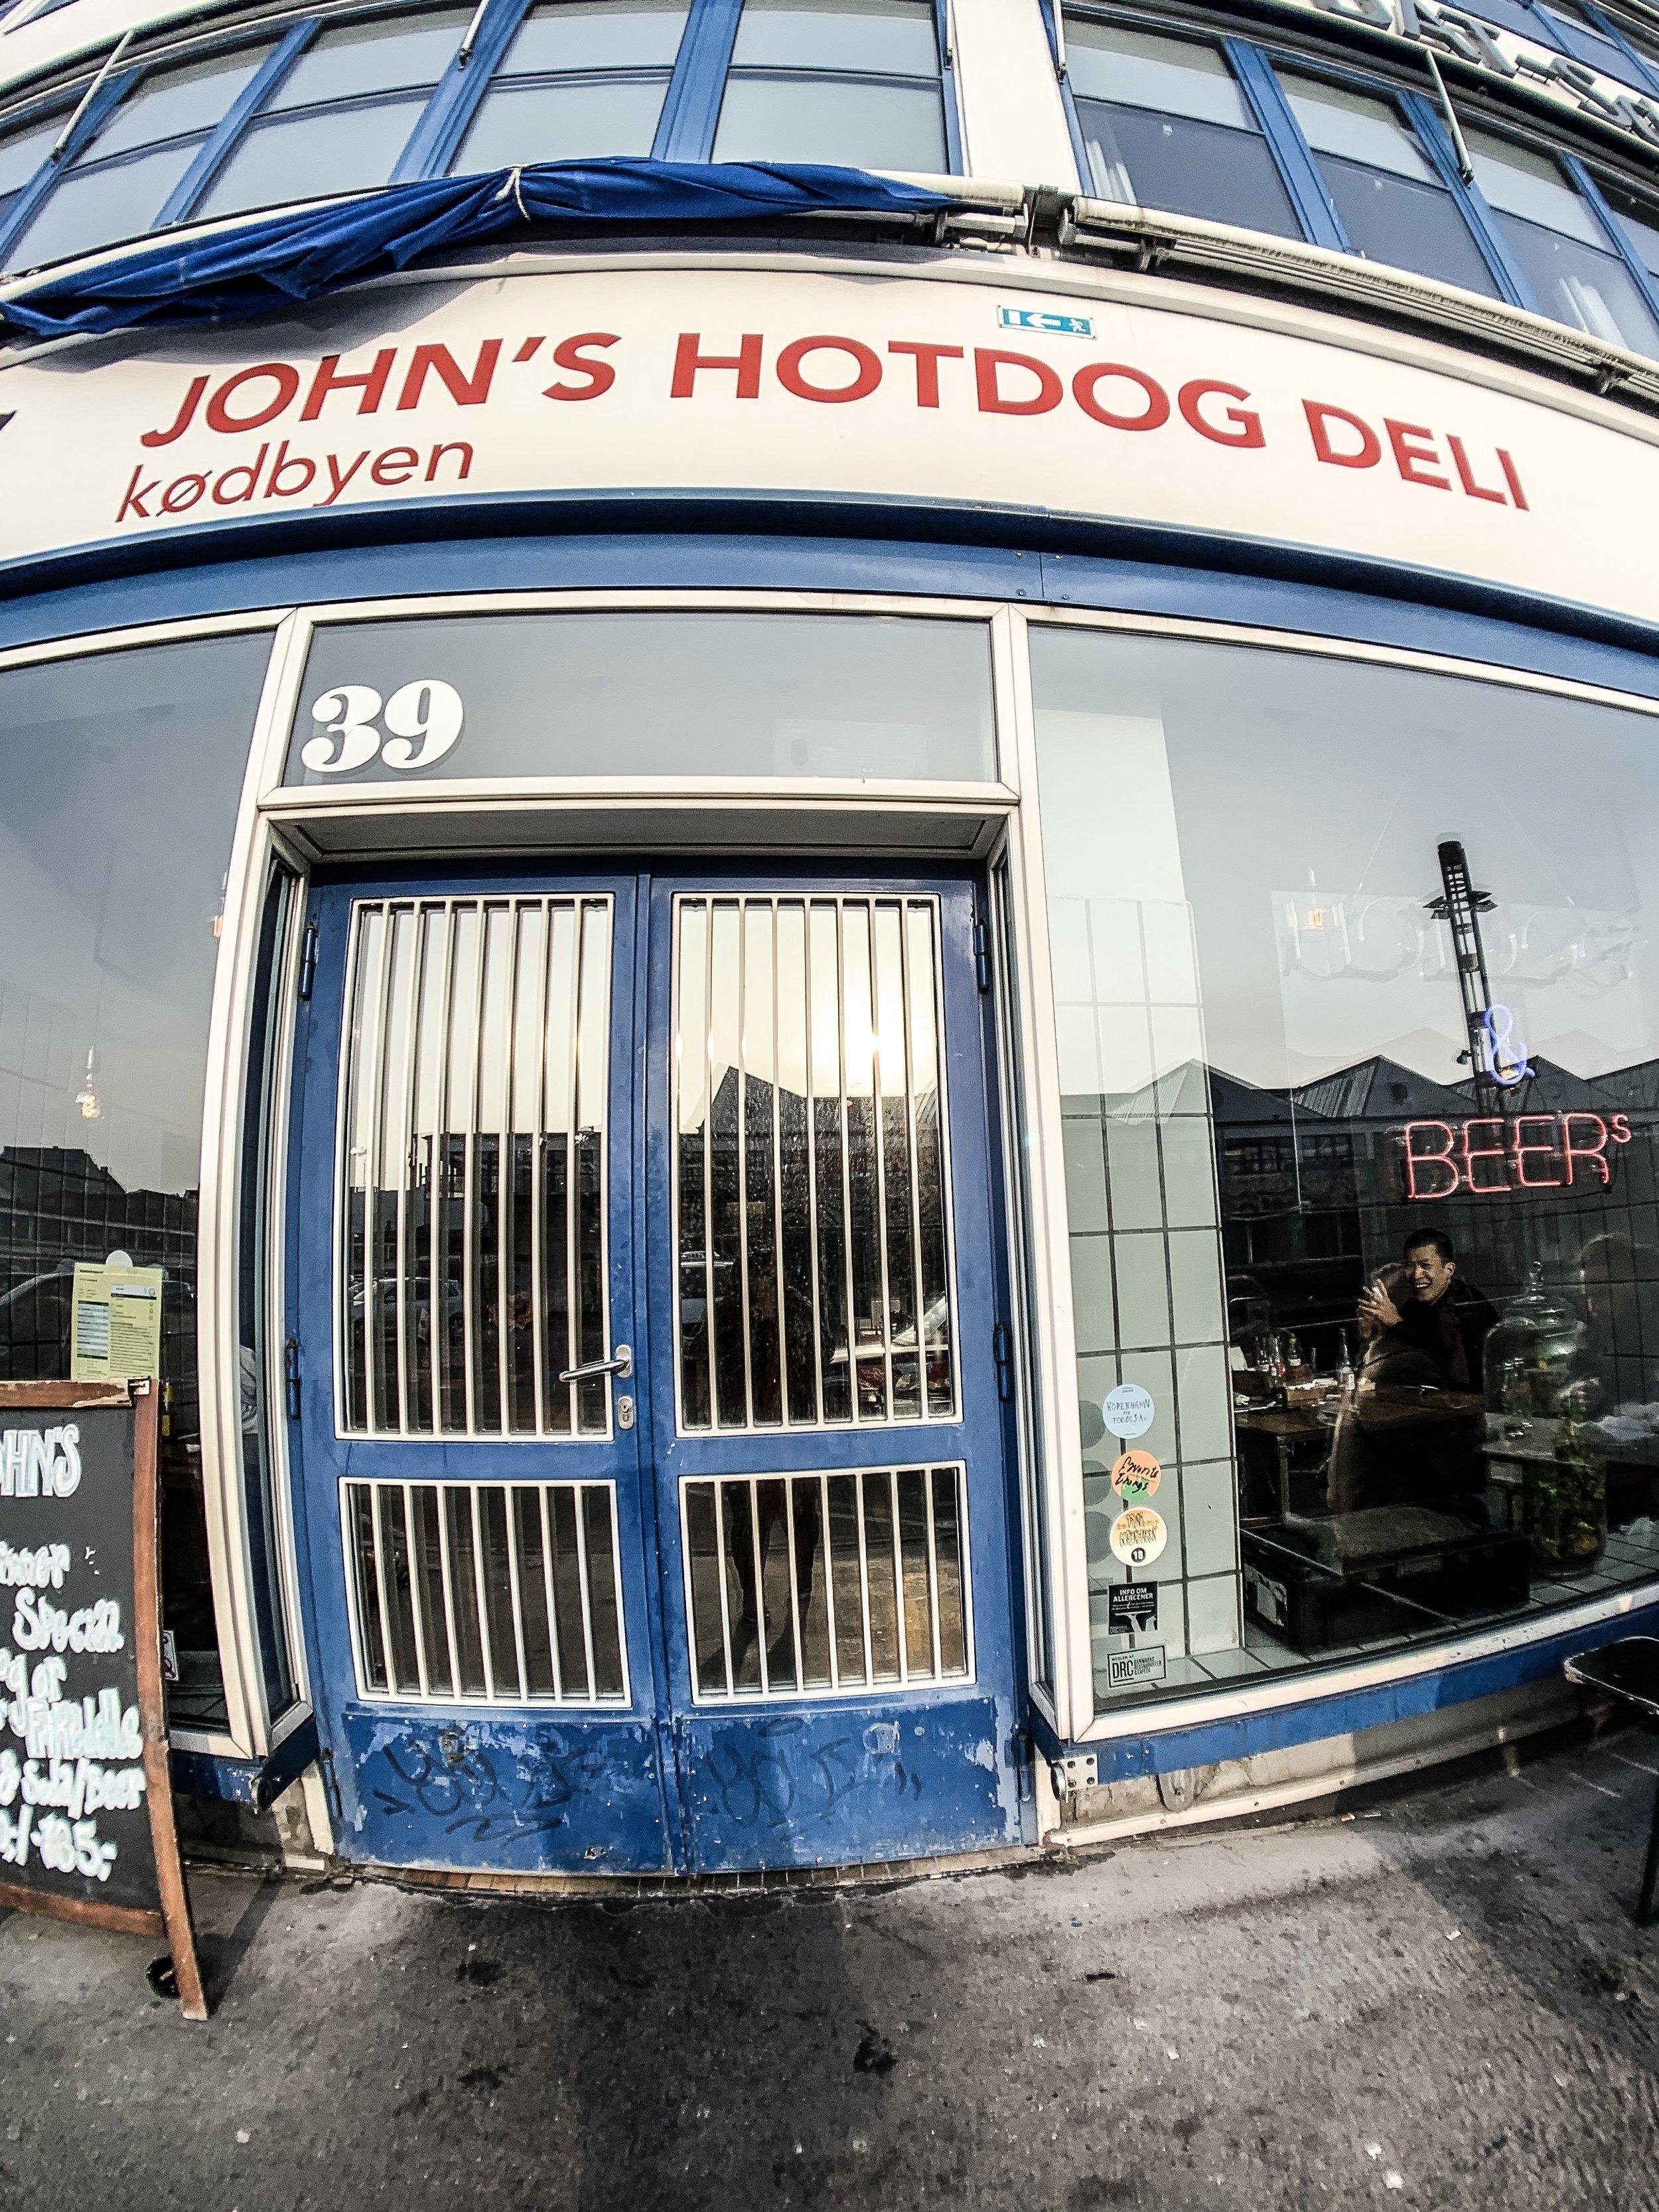 John's Hotdog Deli